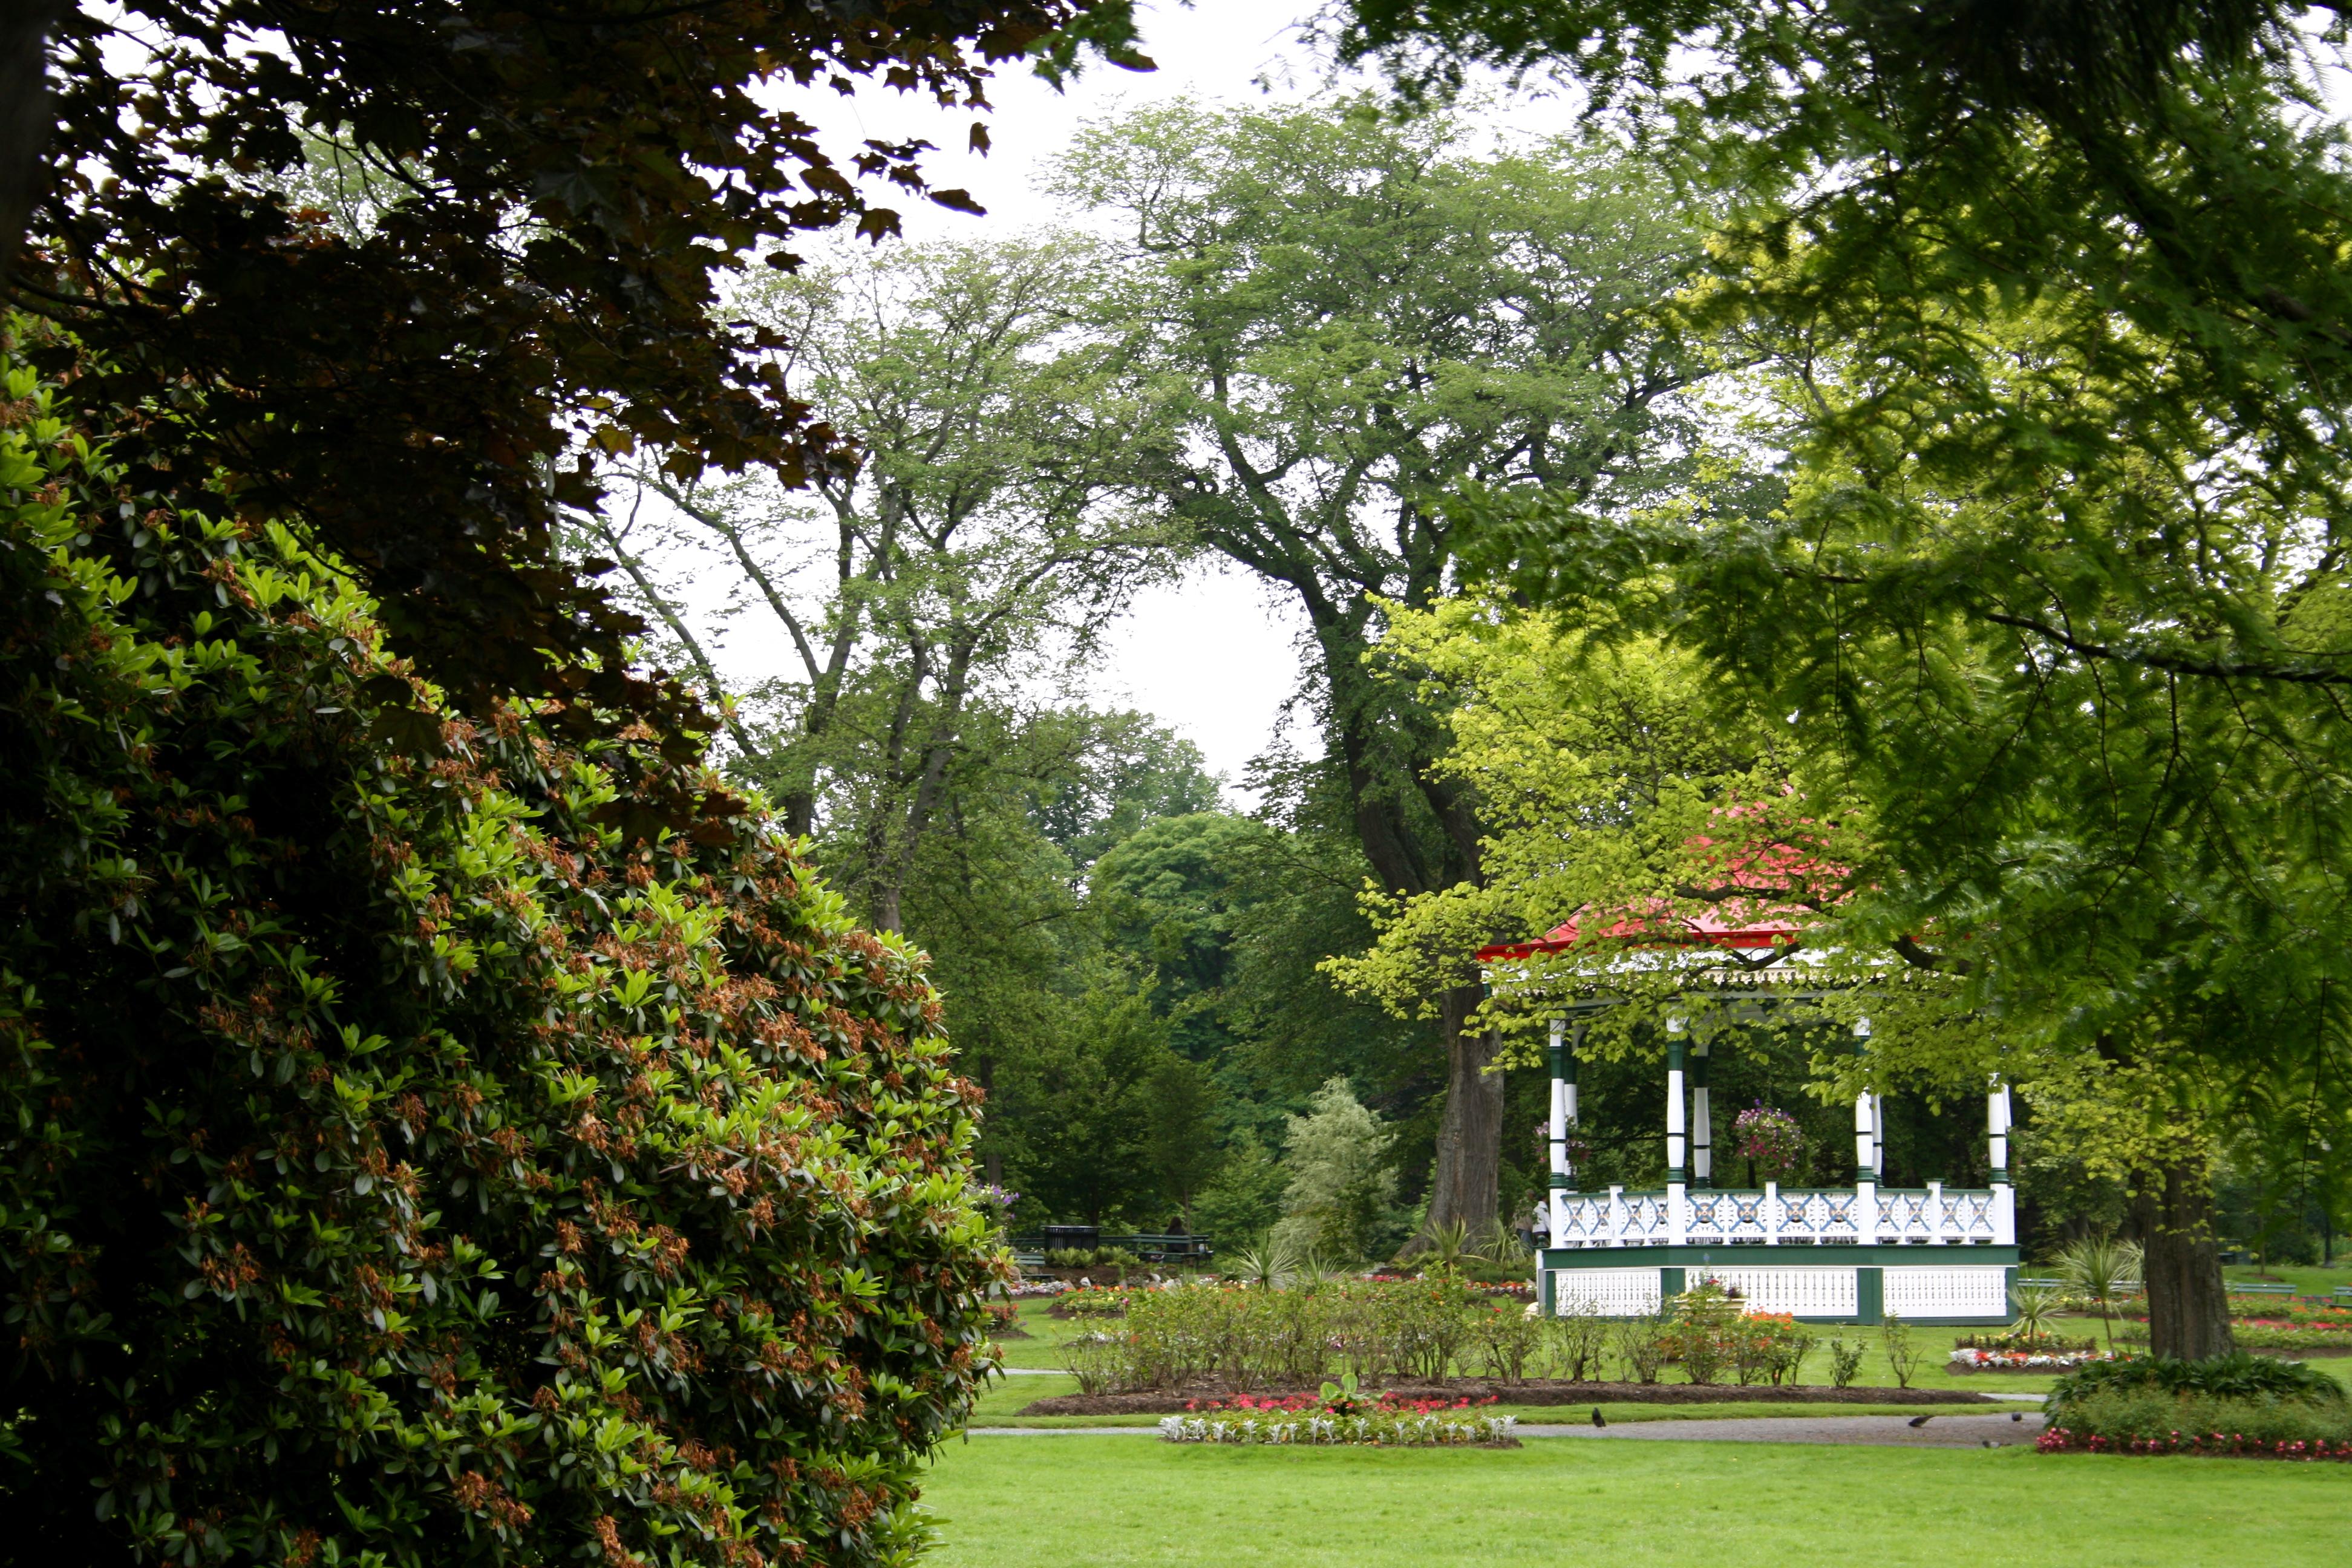 Garden view, Garden, Green, Nature, Park, HQ Photo